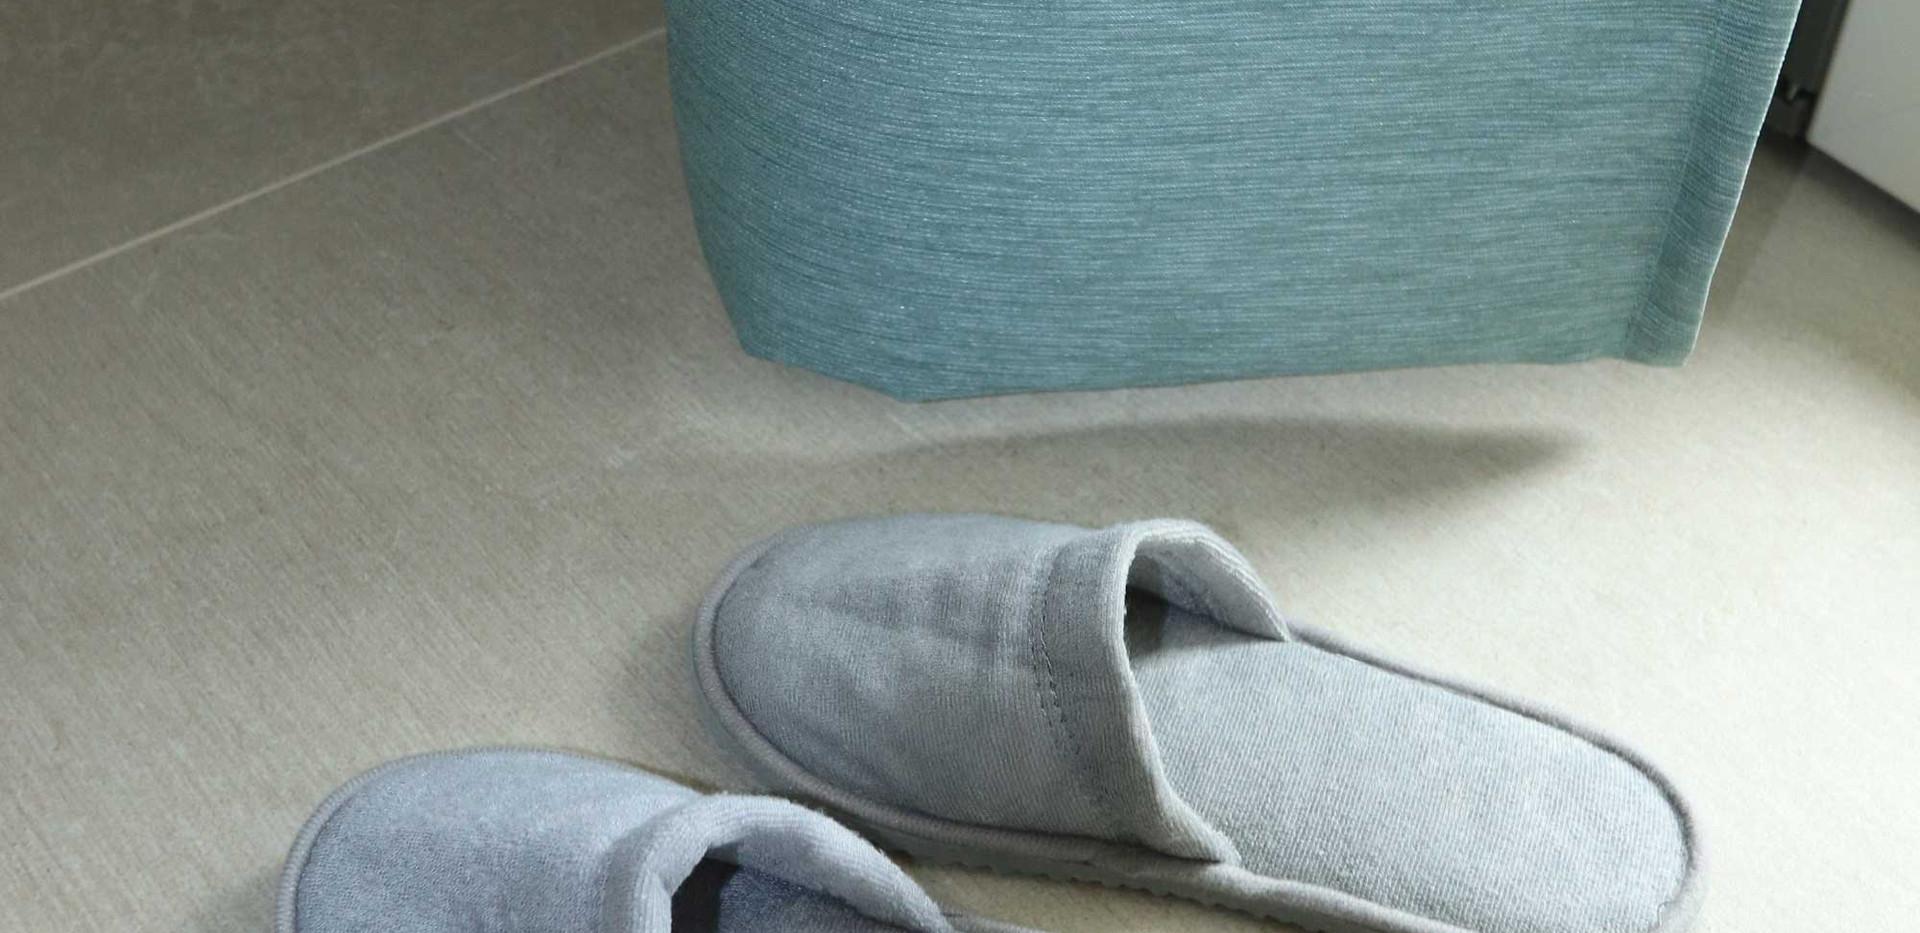 Profumo_di_casa_appartamento_loto_pantof